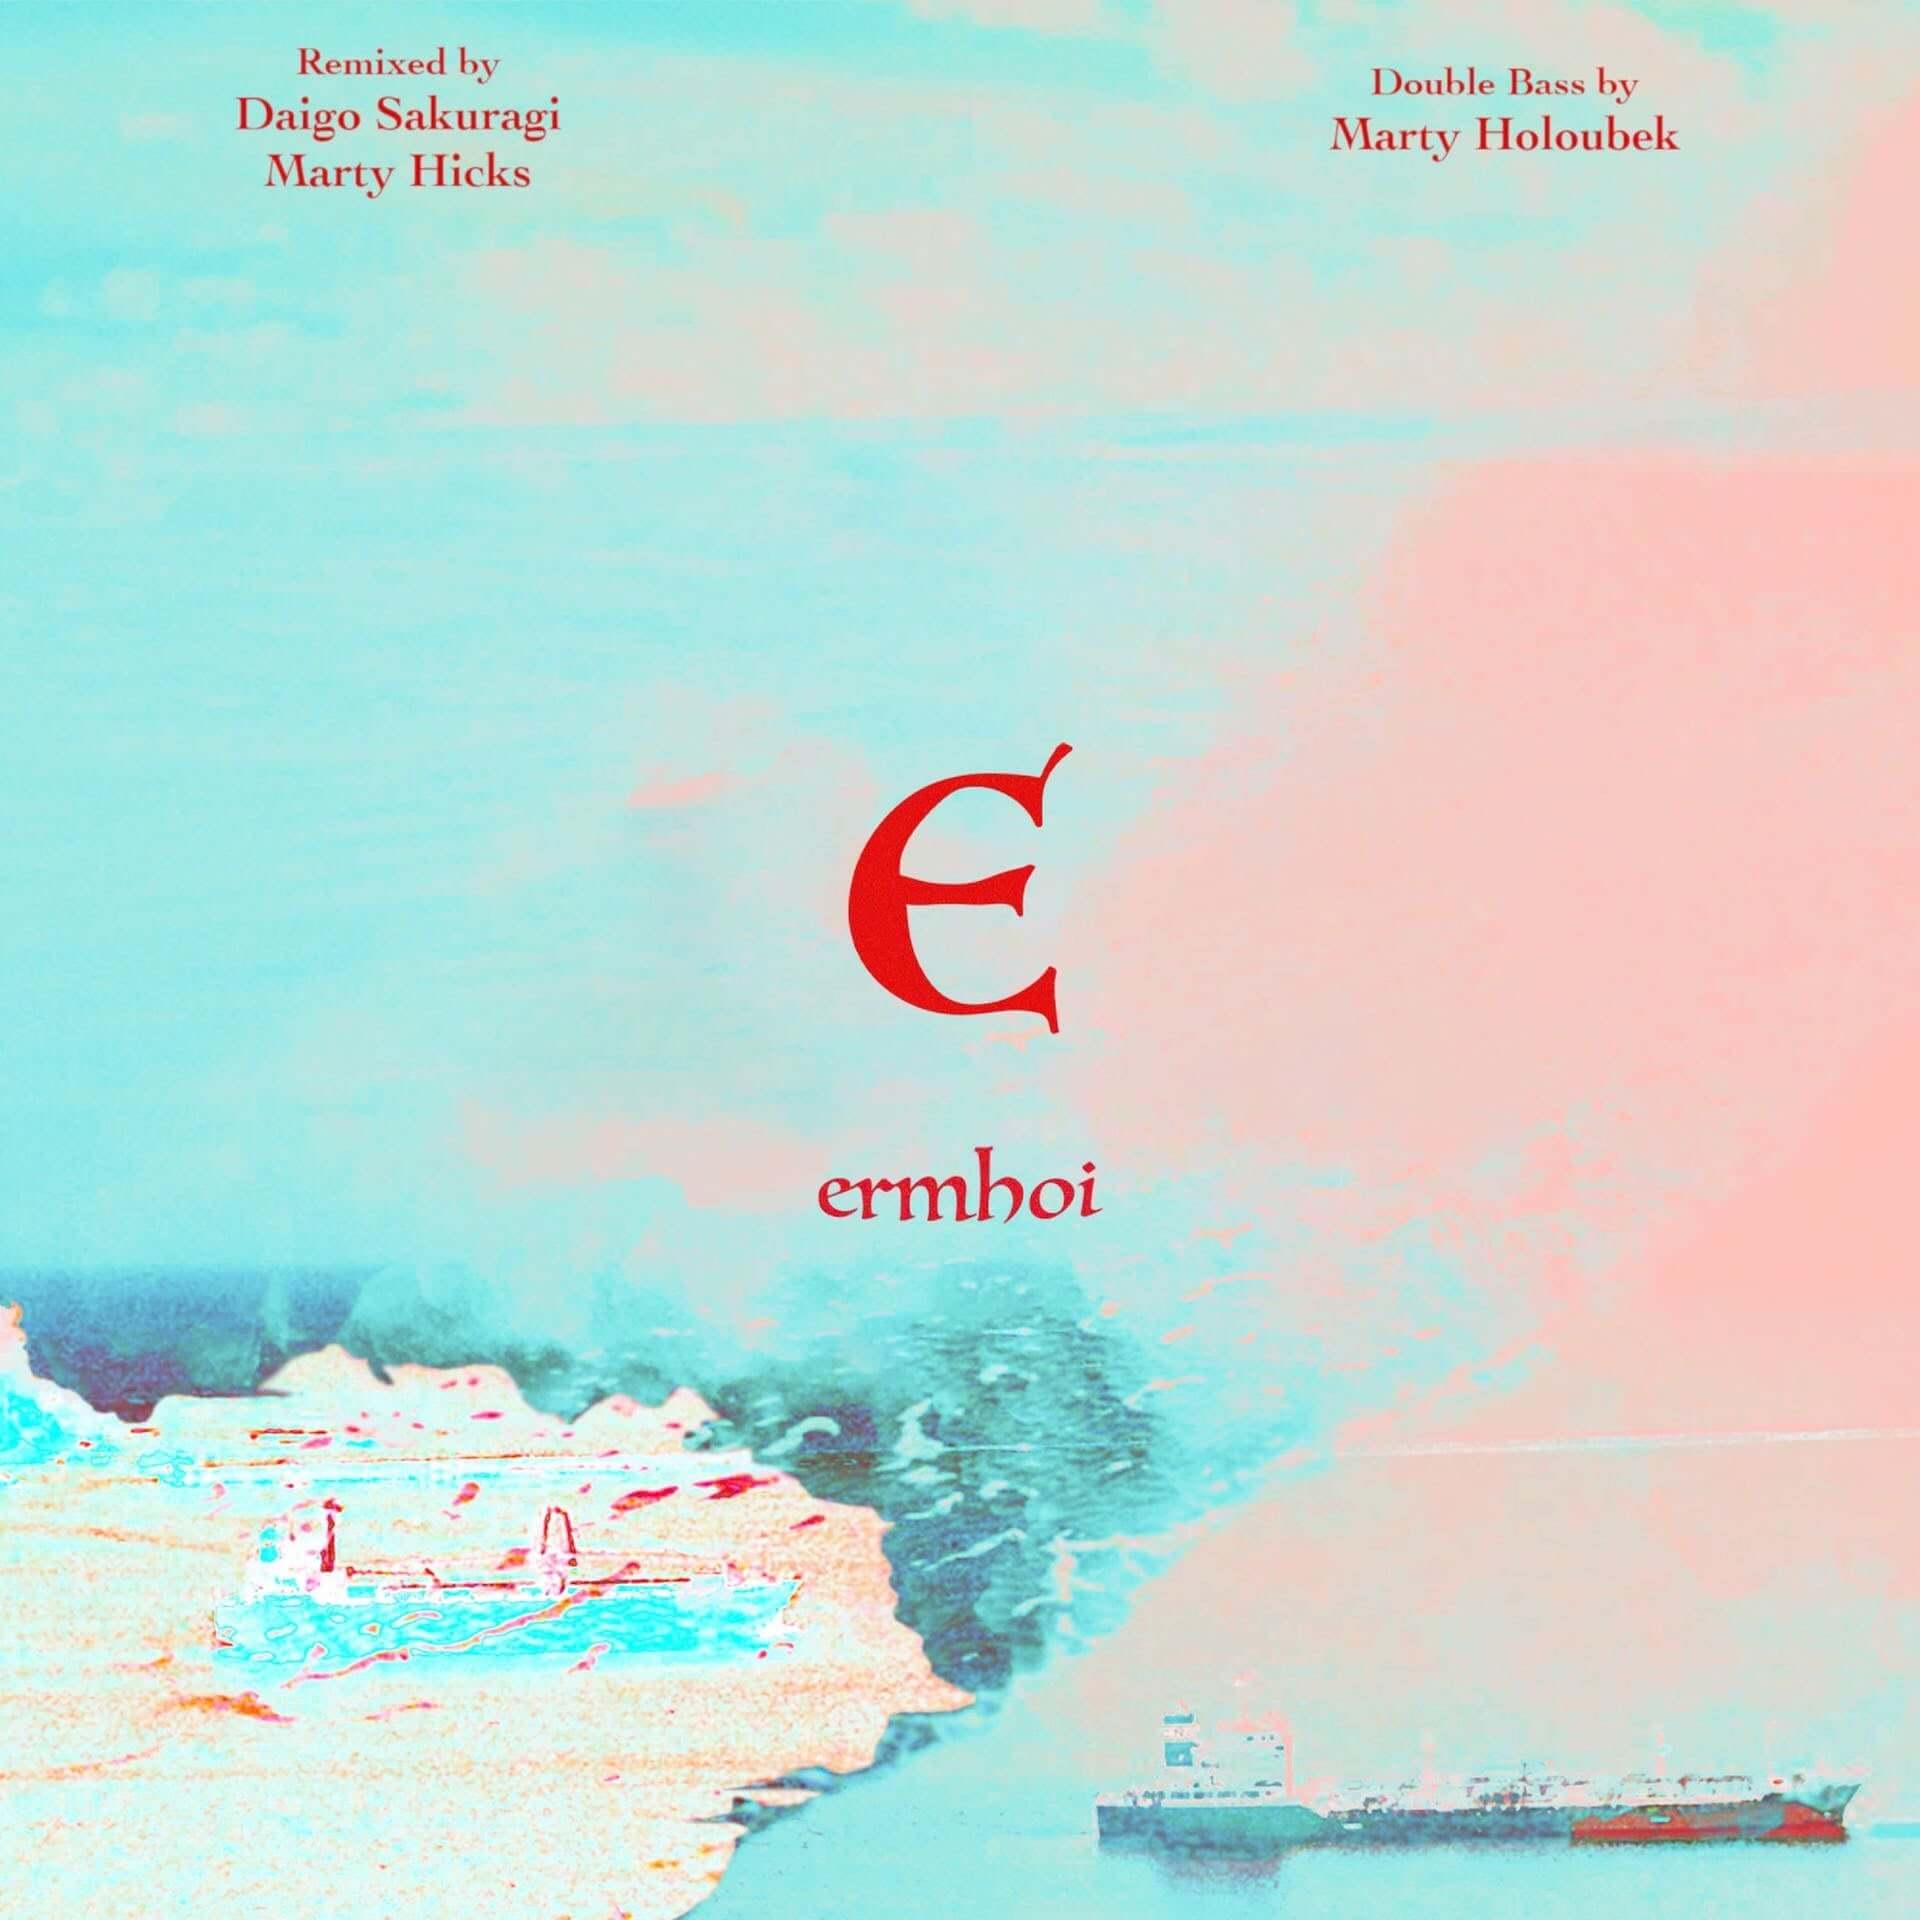 ermhoiがD.A.N.のDaigo Sakuragiを迎えた新EP『E』をリリース!本日放送の『Mステ』3時間SPにはmillennium paradeとして出演 music210219_ermhoi_3-1920x1920